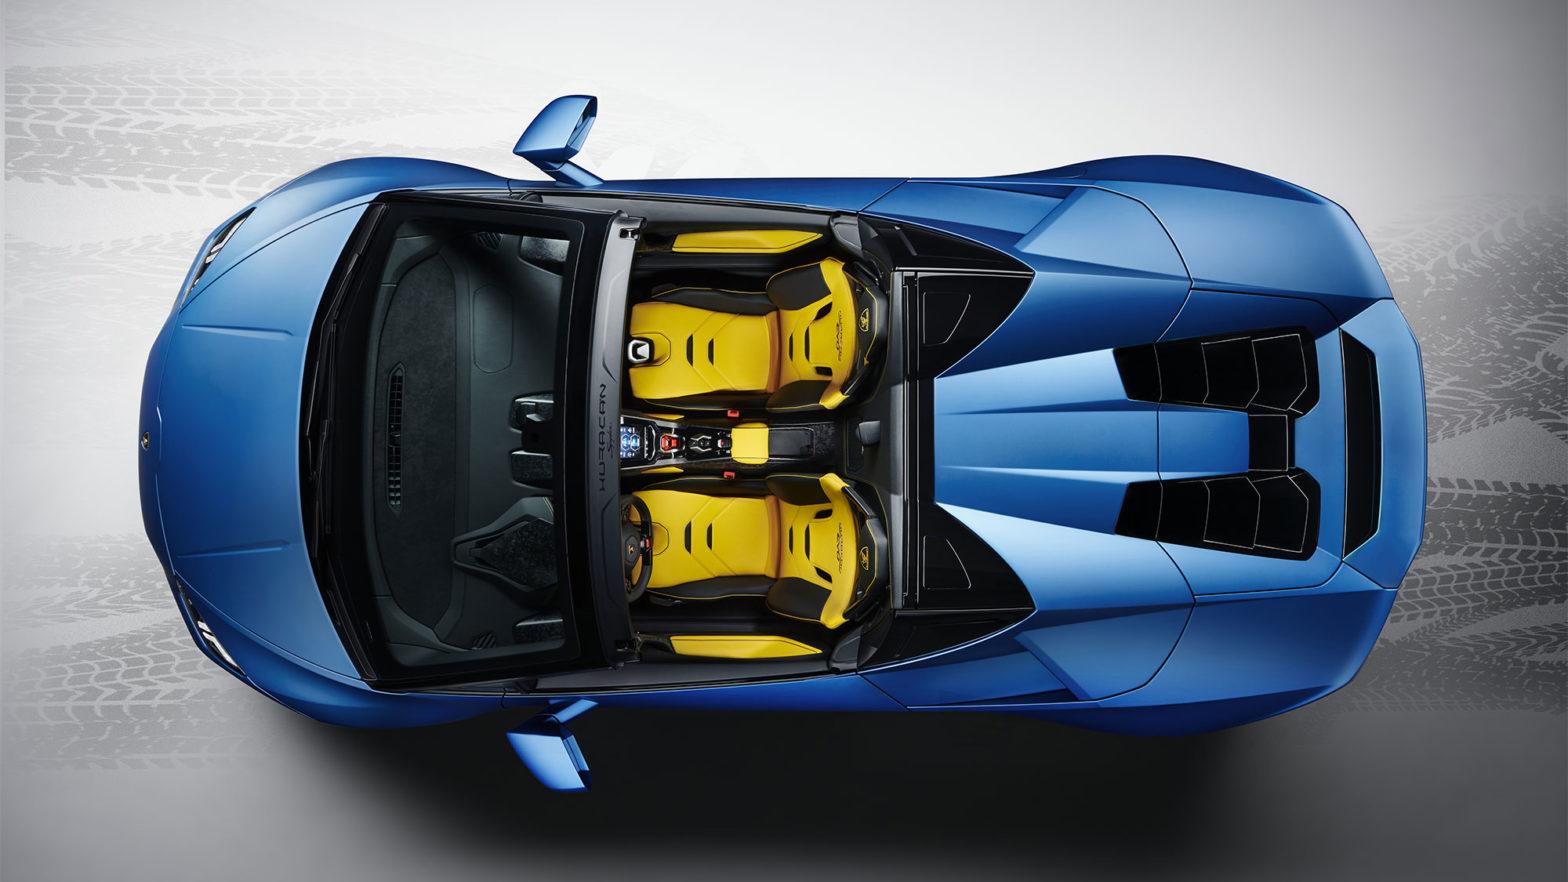 2020 Lamborghini Huracán EVO RWD Spyder